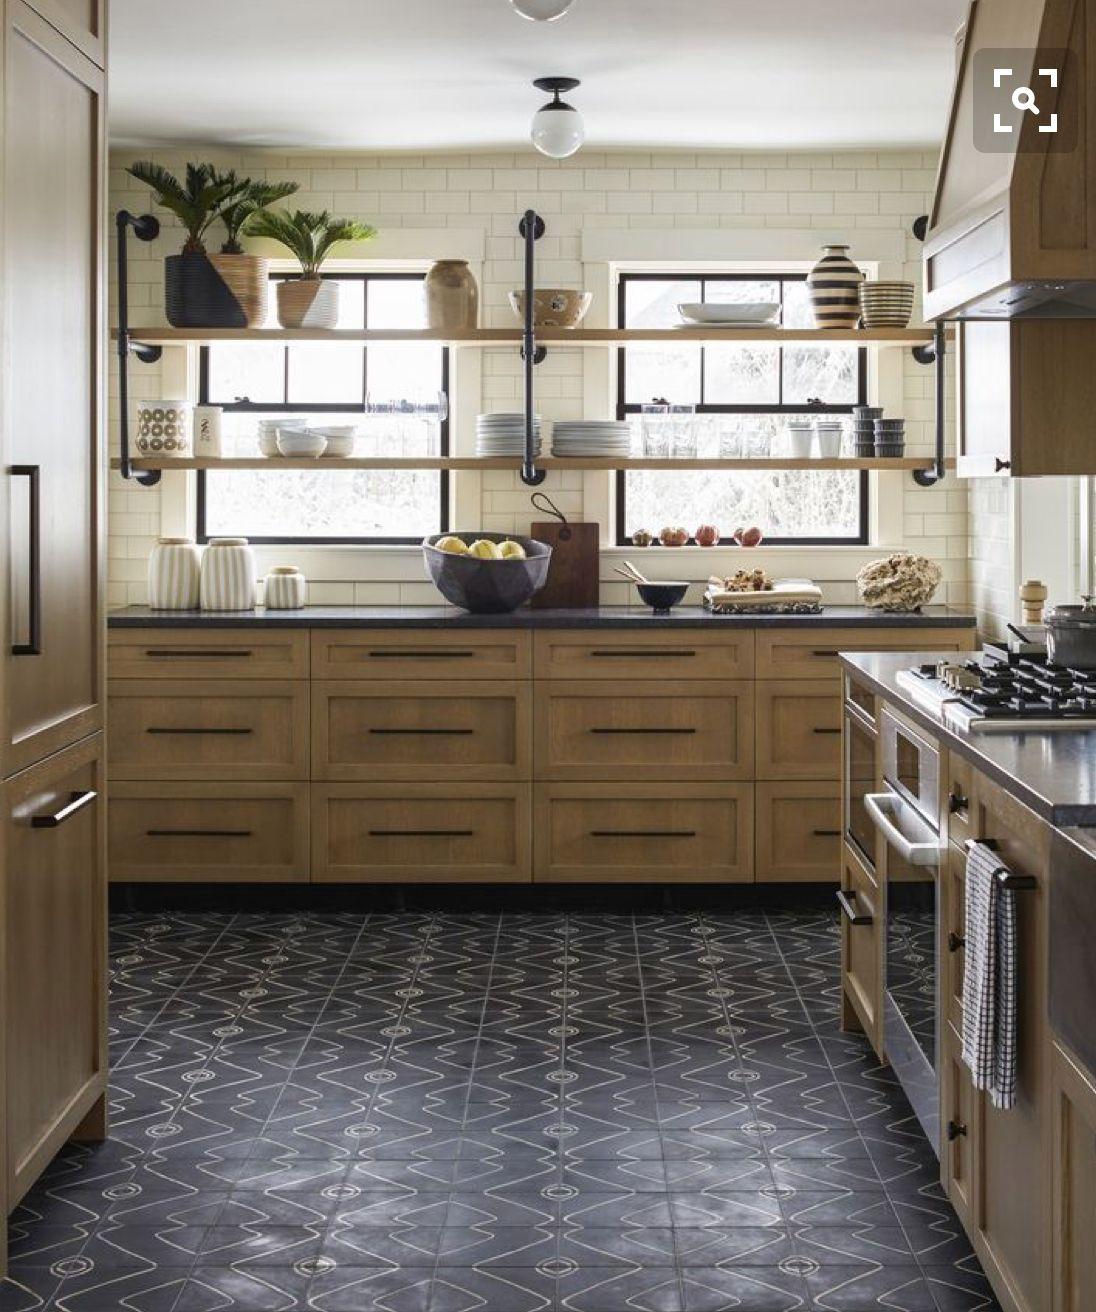 Pin de Jill Guzzo en kitchen | Pinterest